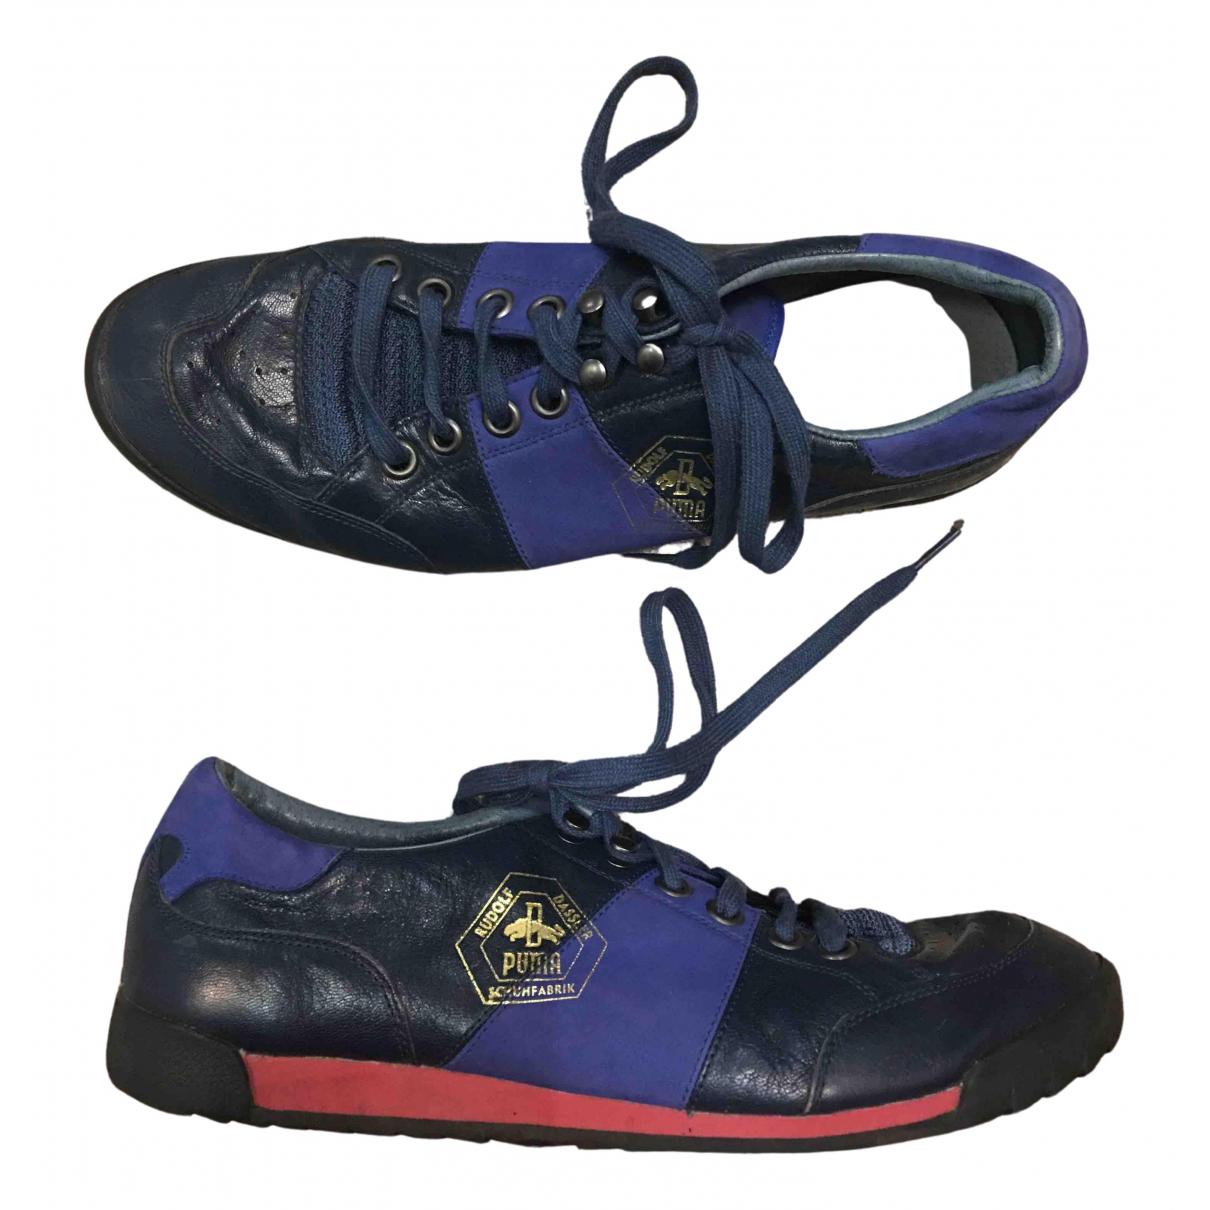 Puma N Blue Leather Trainers for Men 43 EU